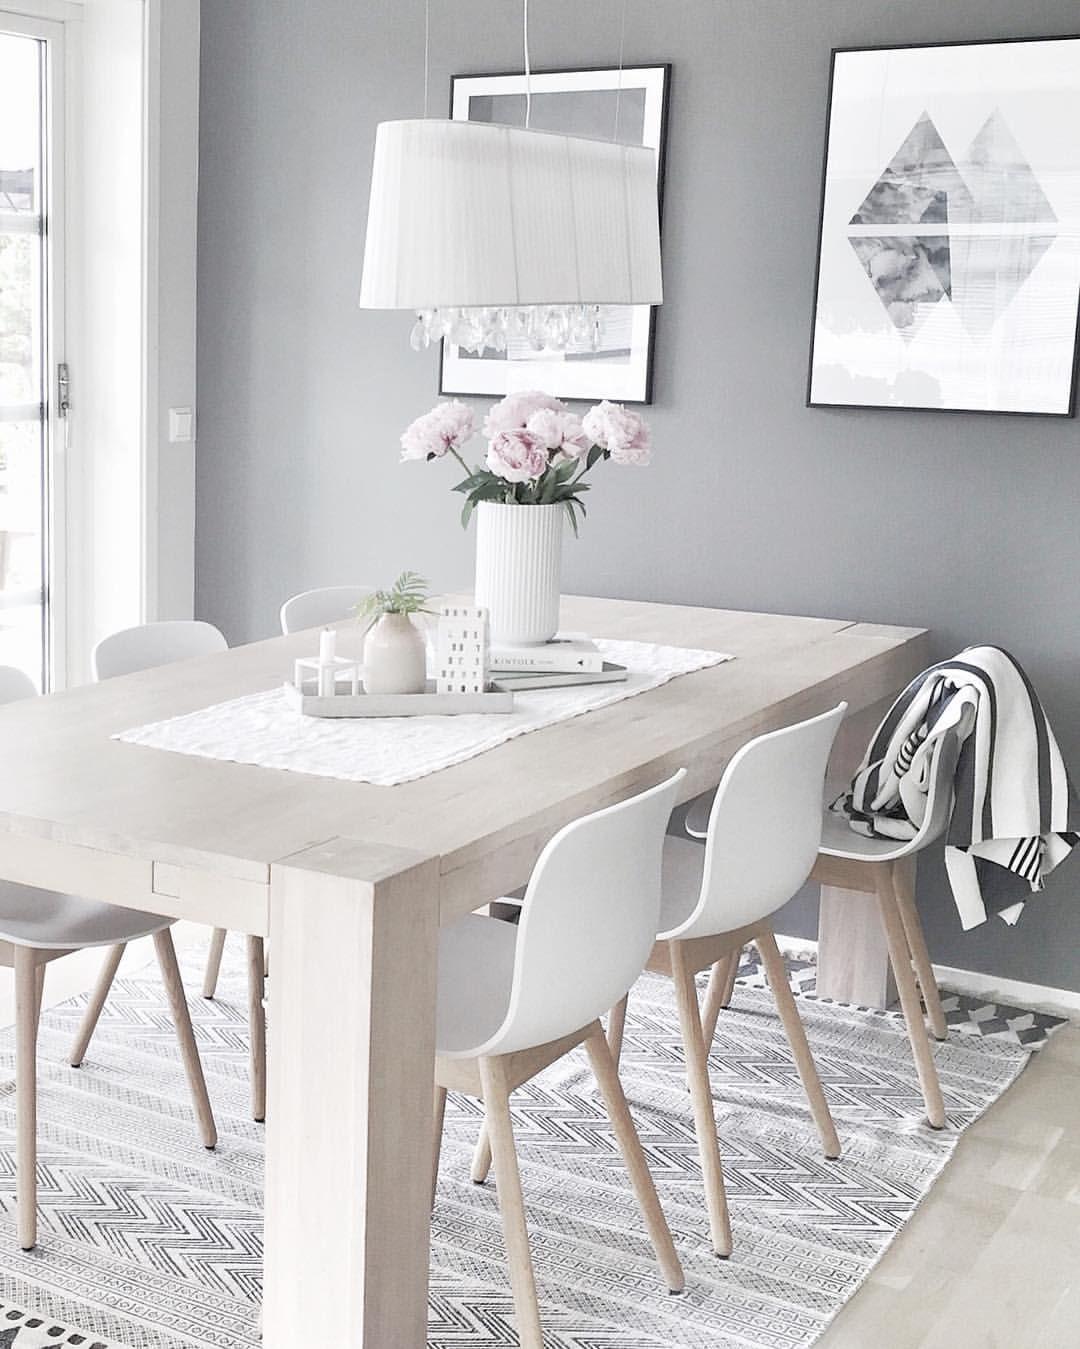 Home Sweet Home | Decor Inspiration | Interior Design | Scandinavian Home | Nordic Style | Dinning Room | Neutrals | Dining @moniithe